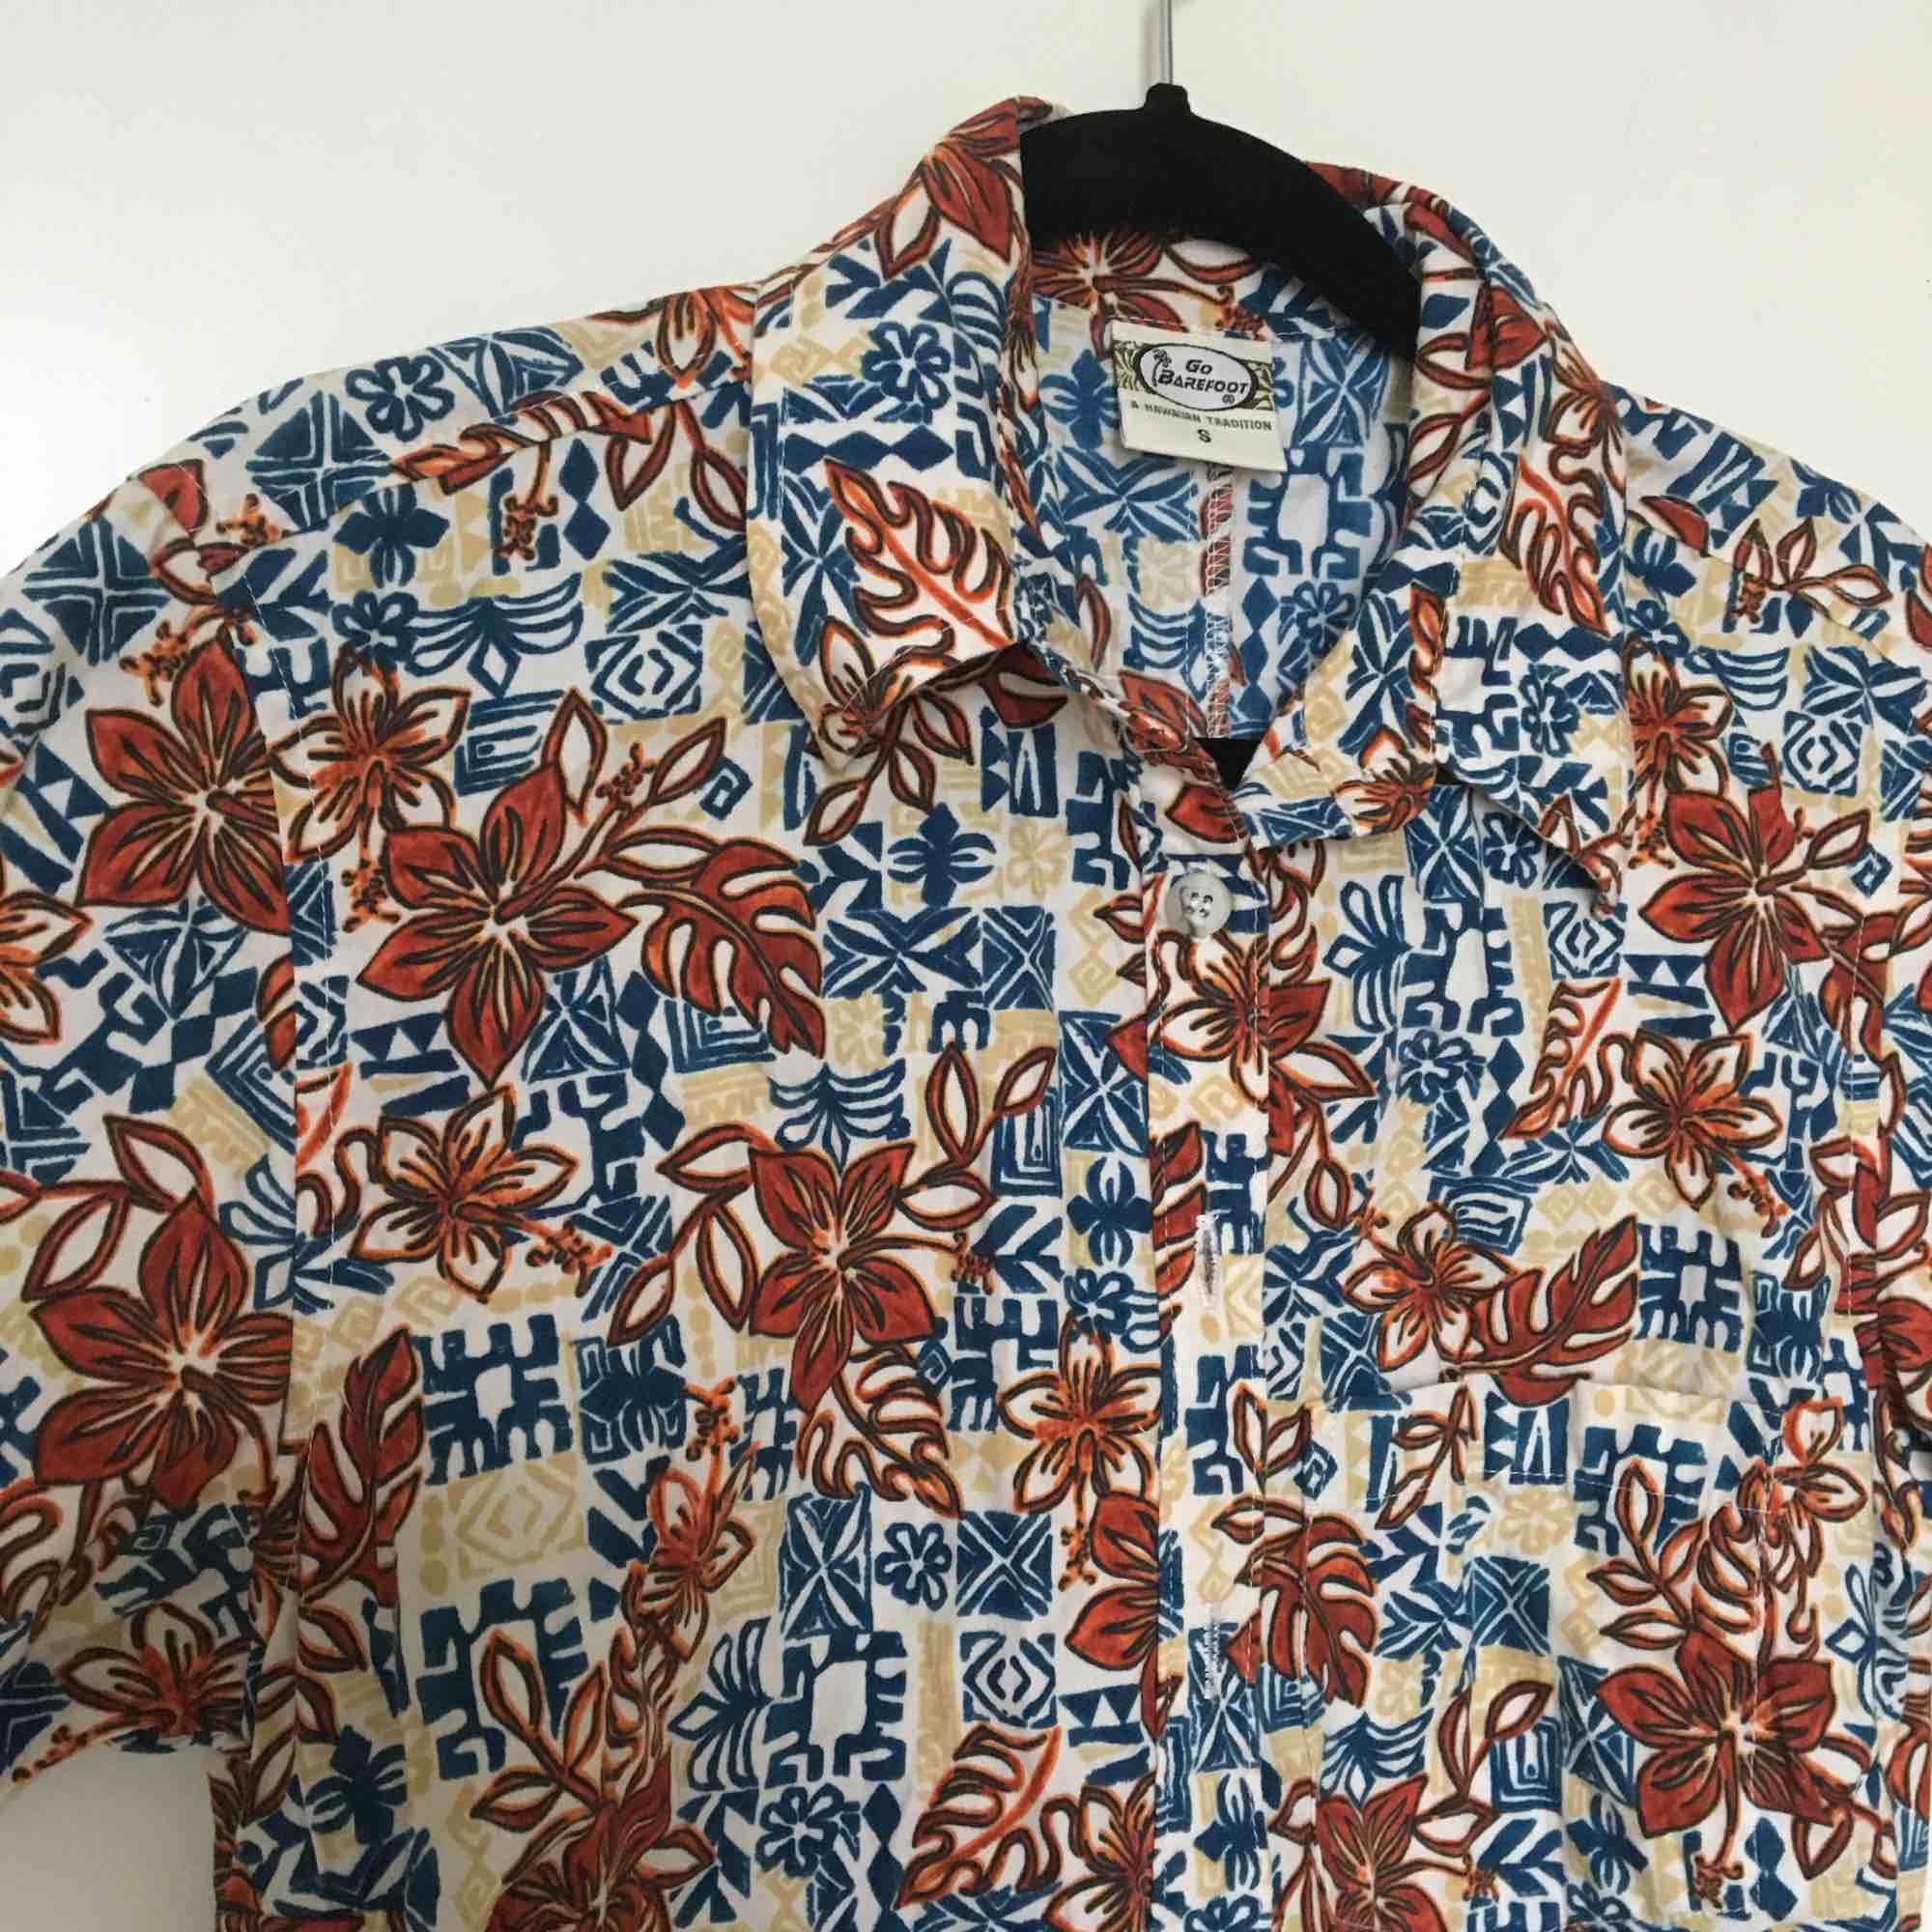 Skitsnygg Hawaii skjorta . Skjortor.